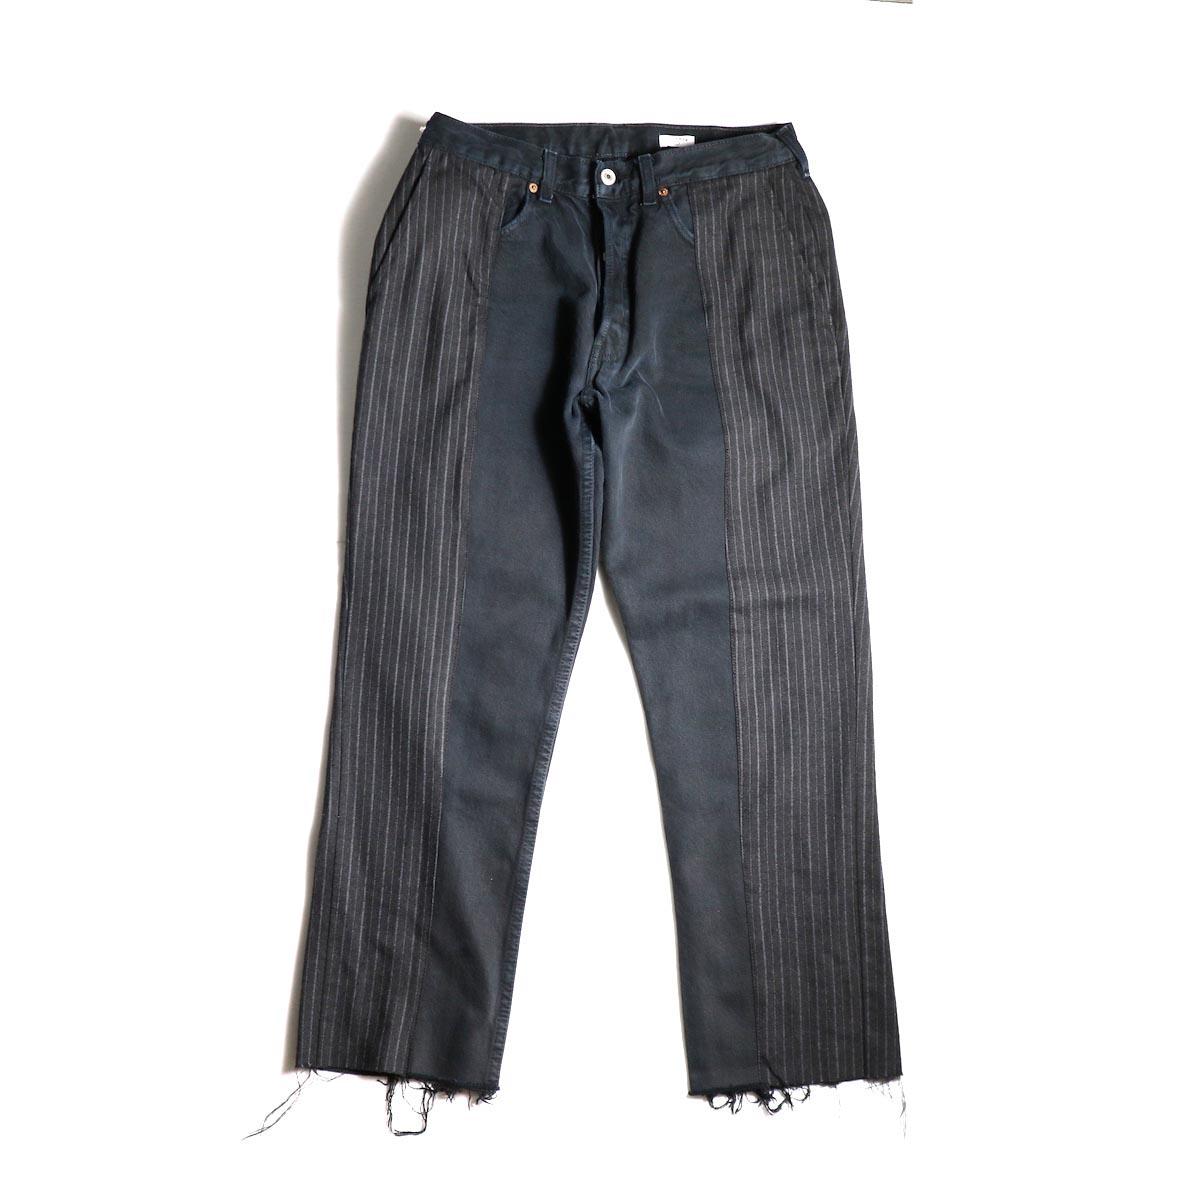 OLD PARK / Docking Jeans Black (Ssize-A)